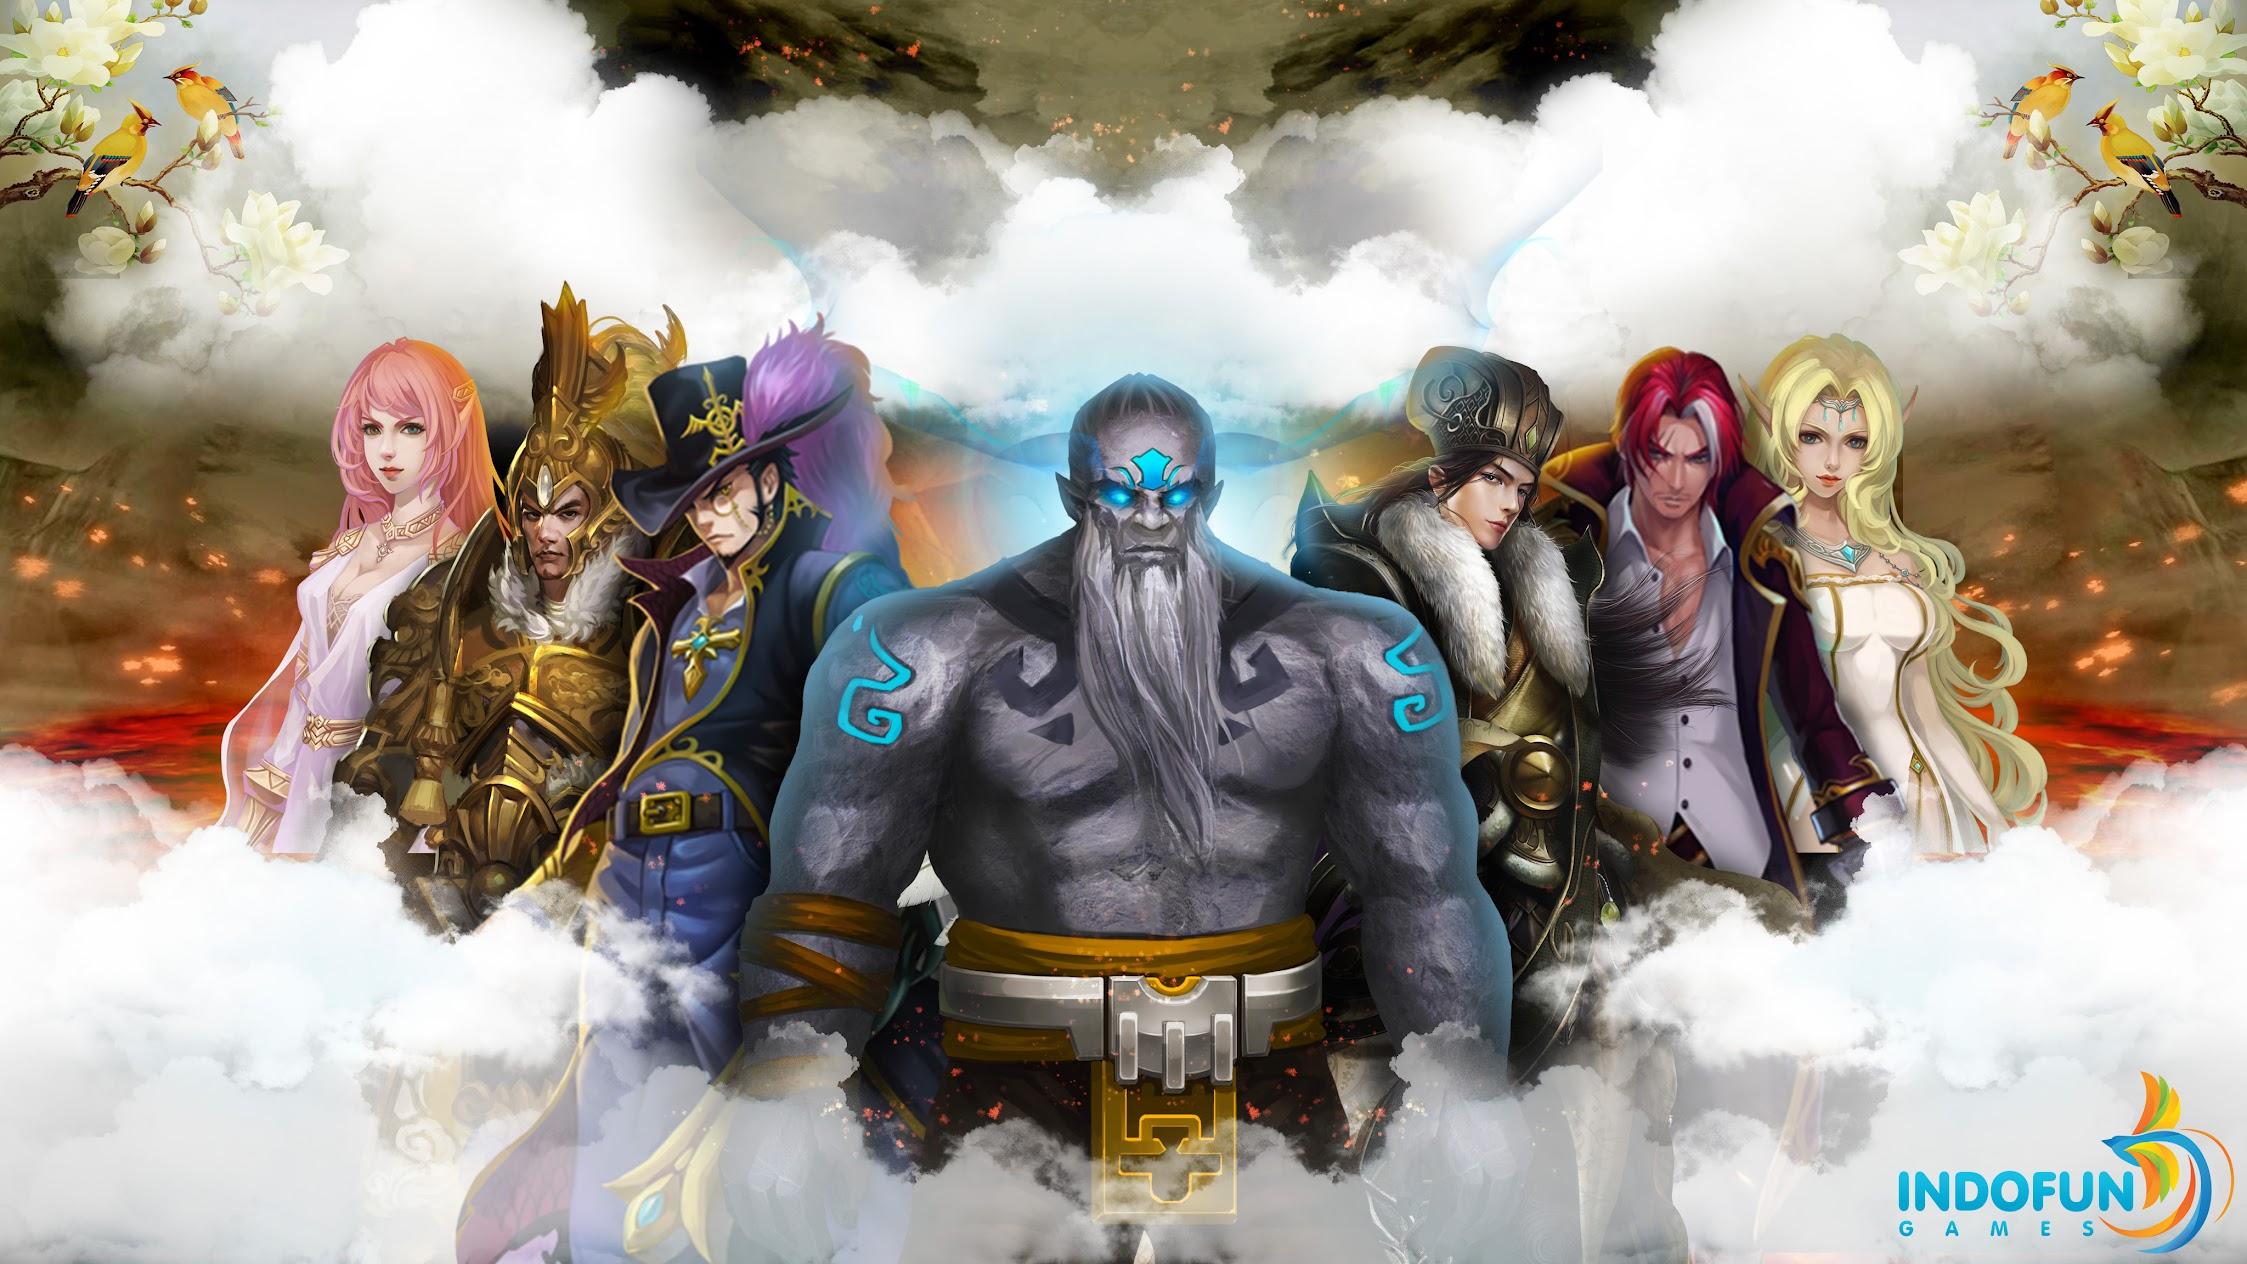 Indofun Games